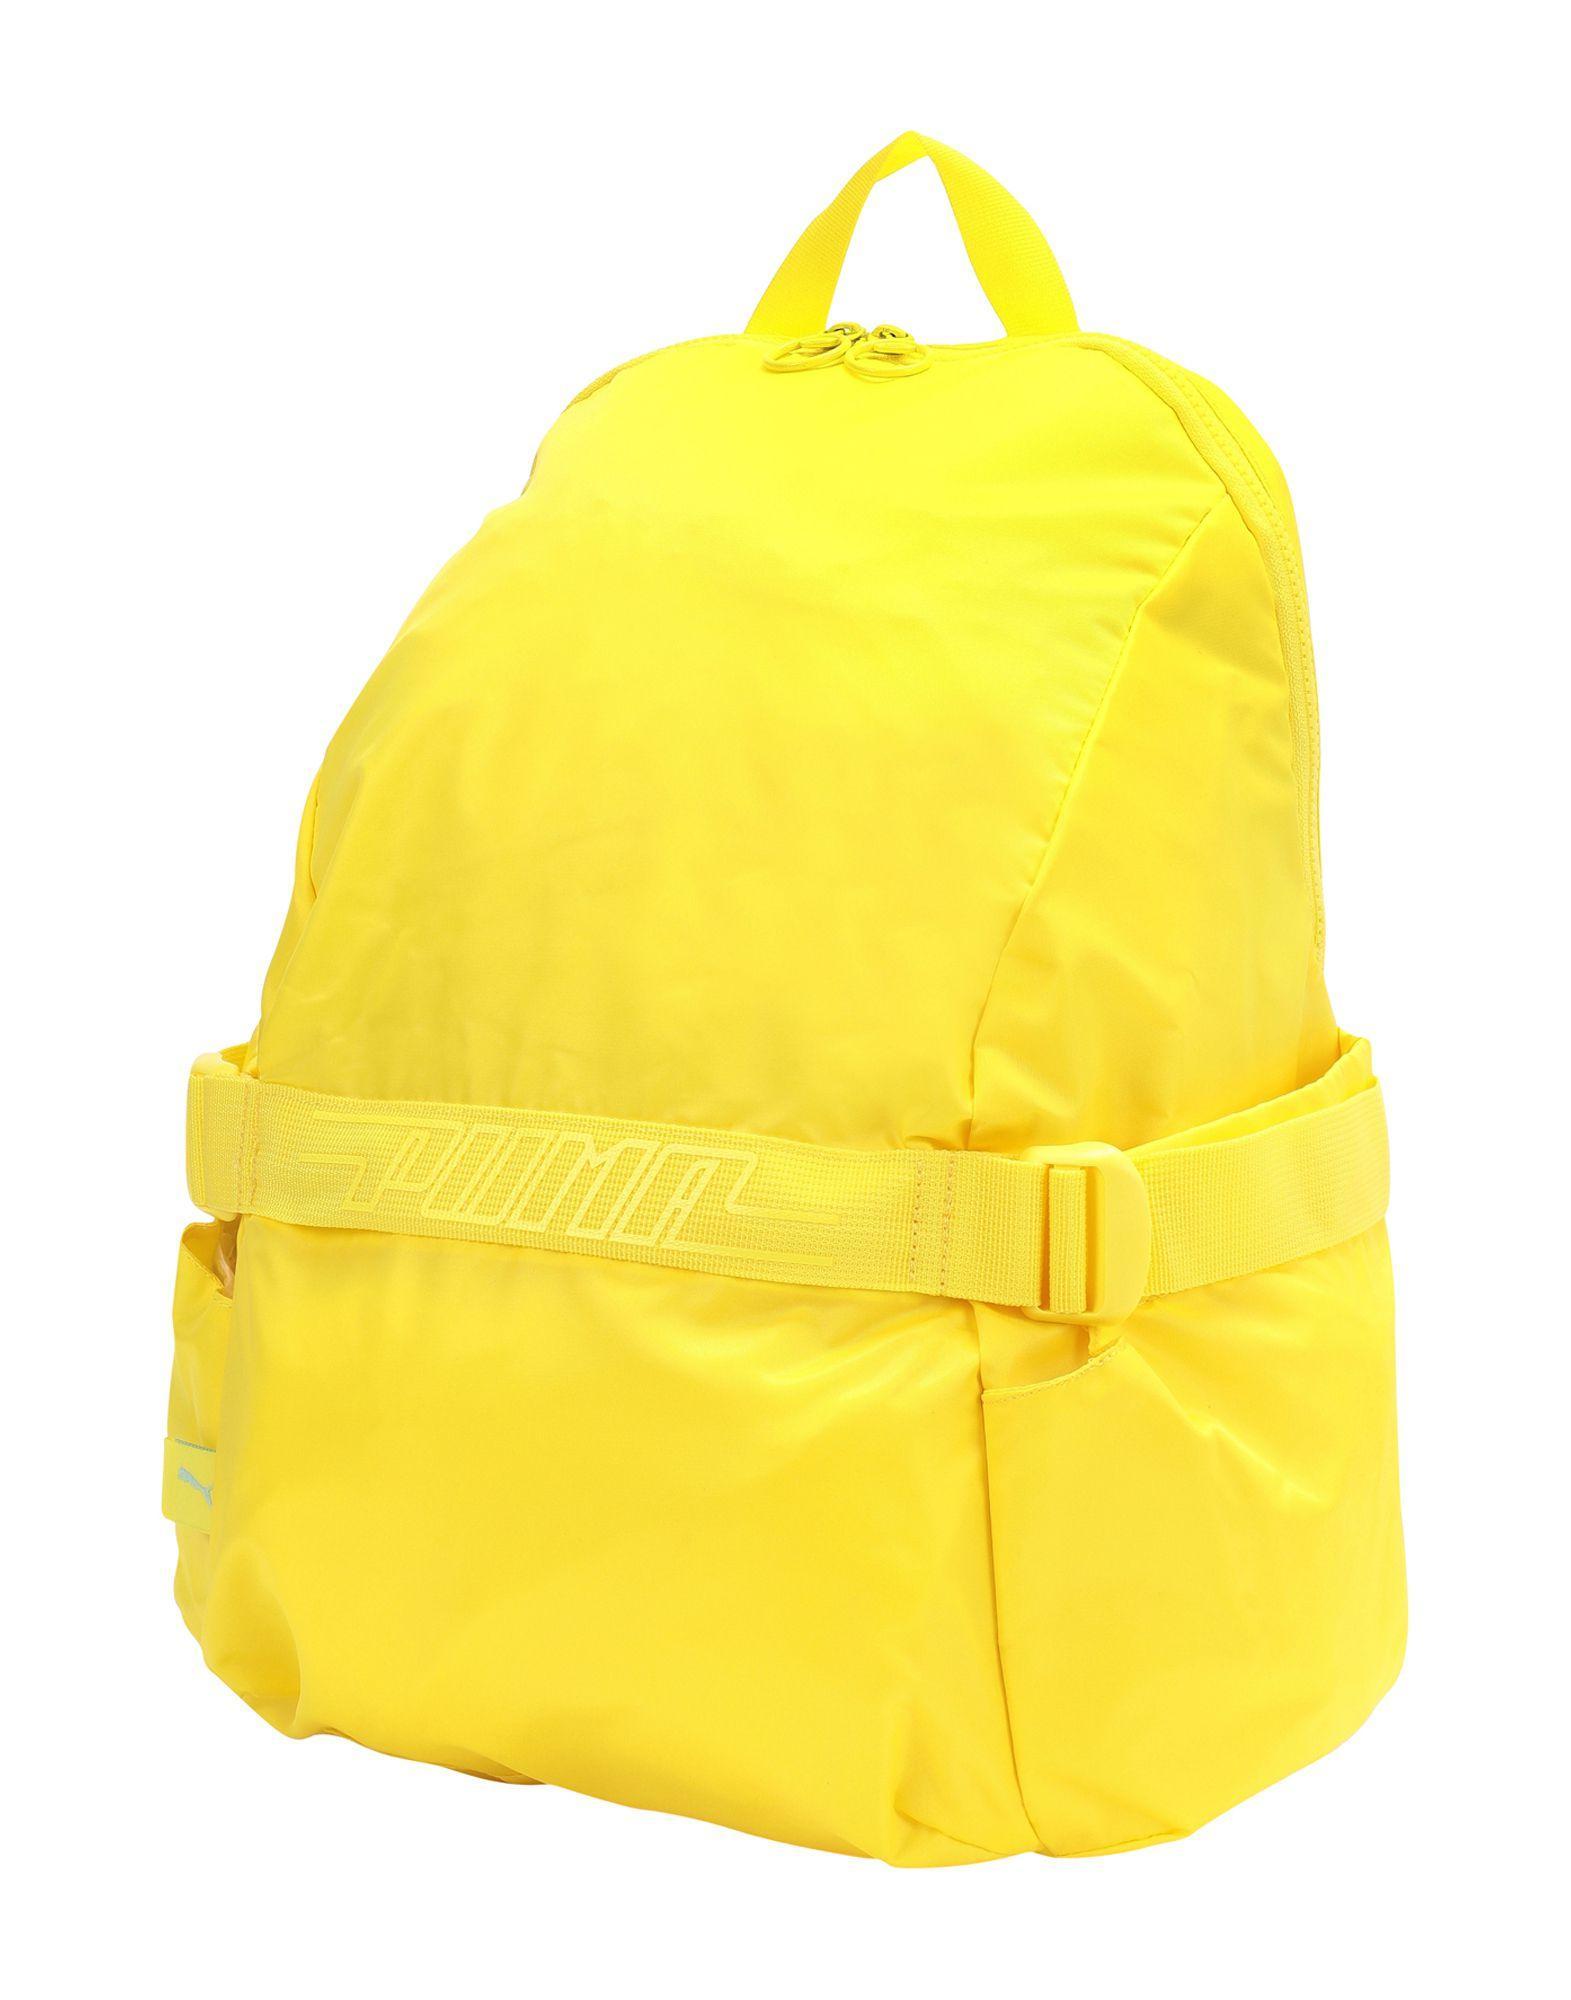 mochila puma amarilla